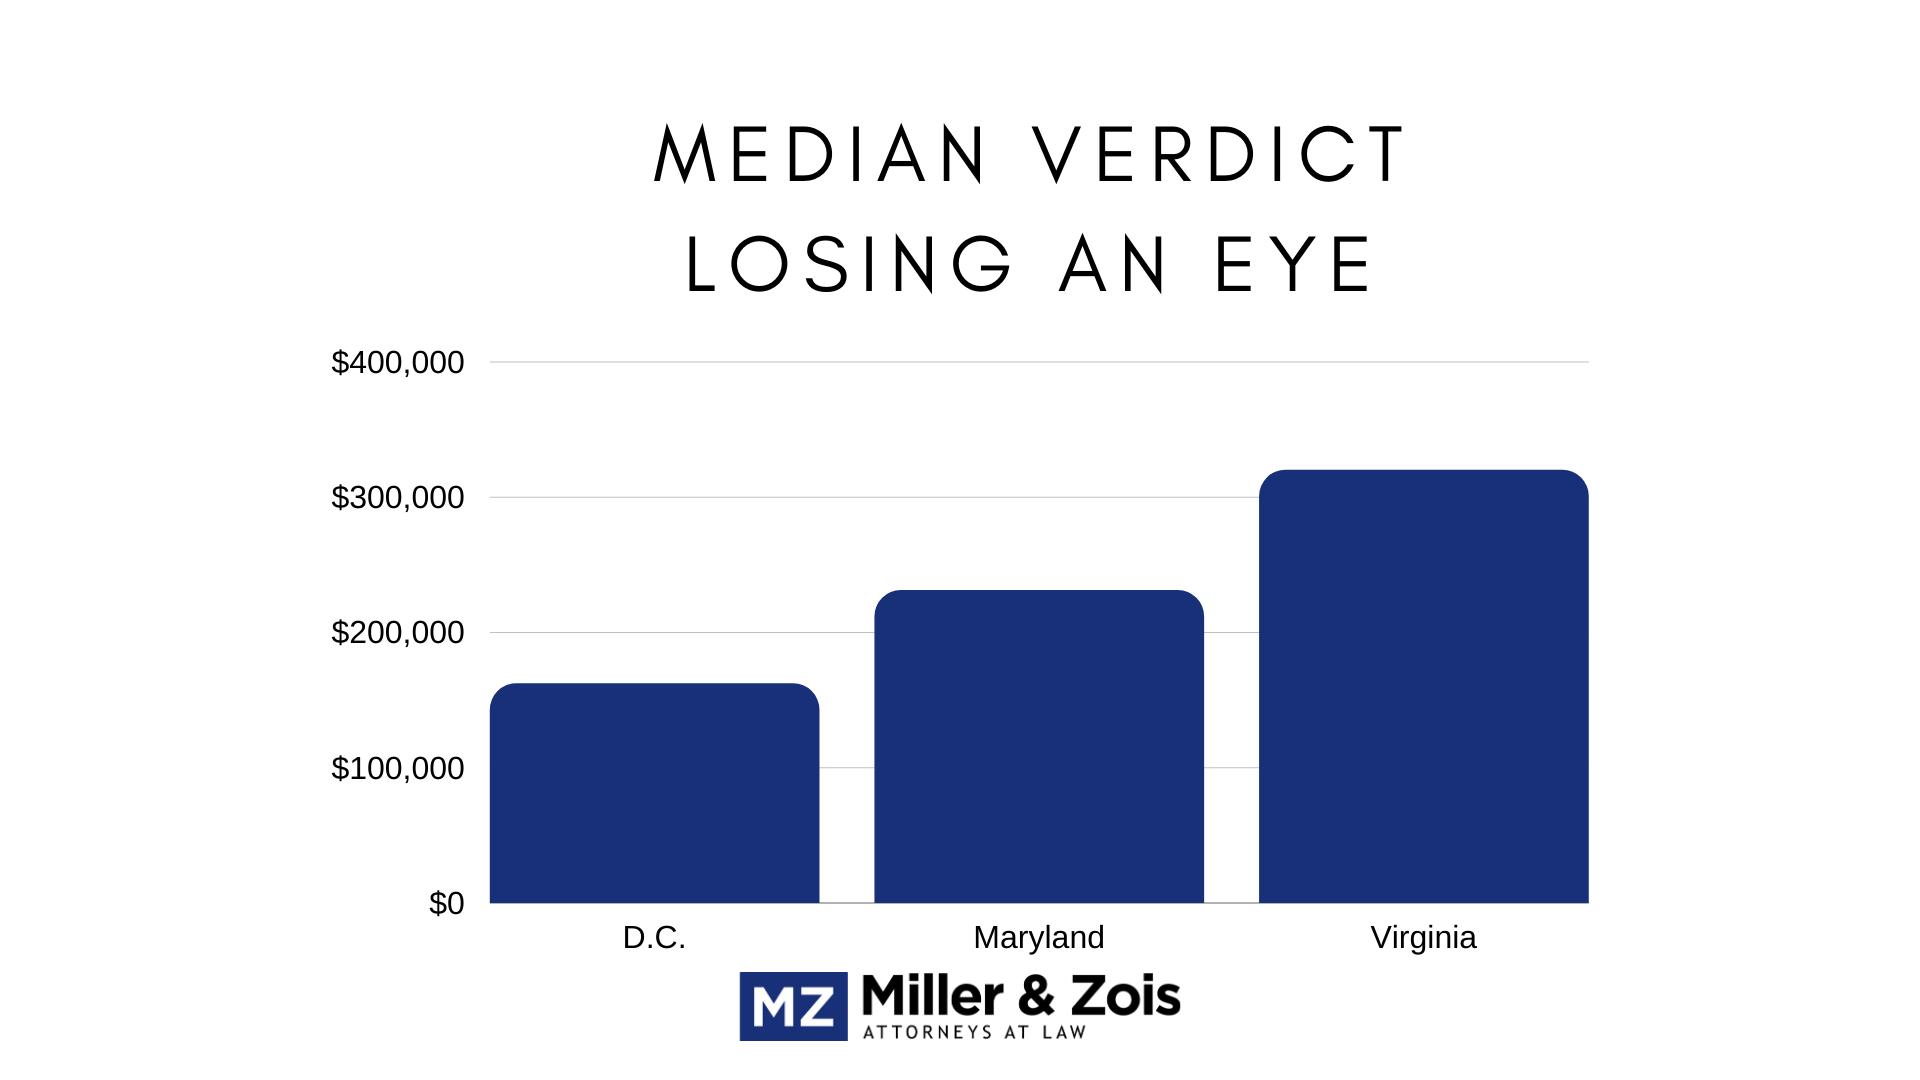 eye loss verdicts